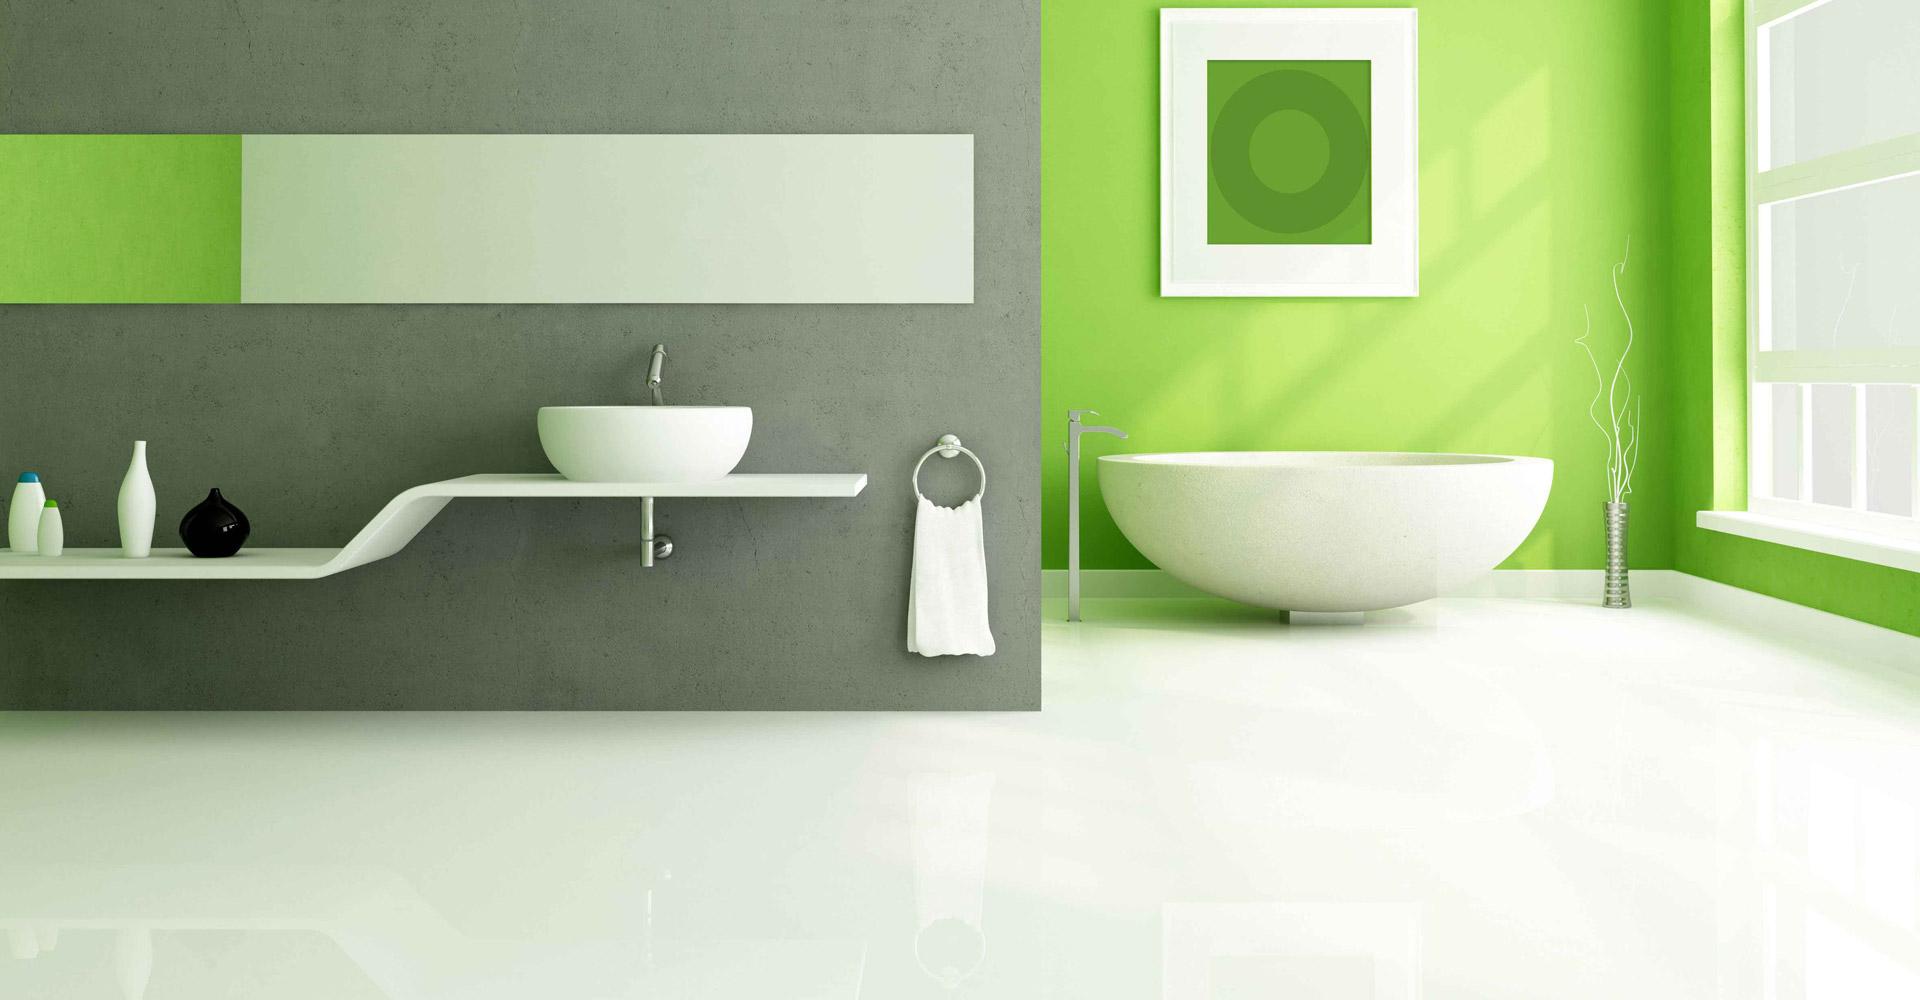 kitchen-tiles-design-kajaria-unique-ideas-13-home-decor